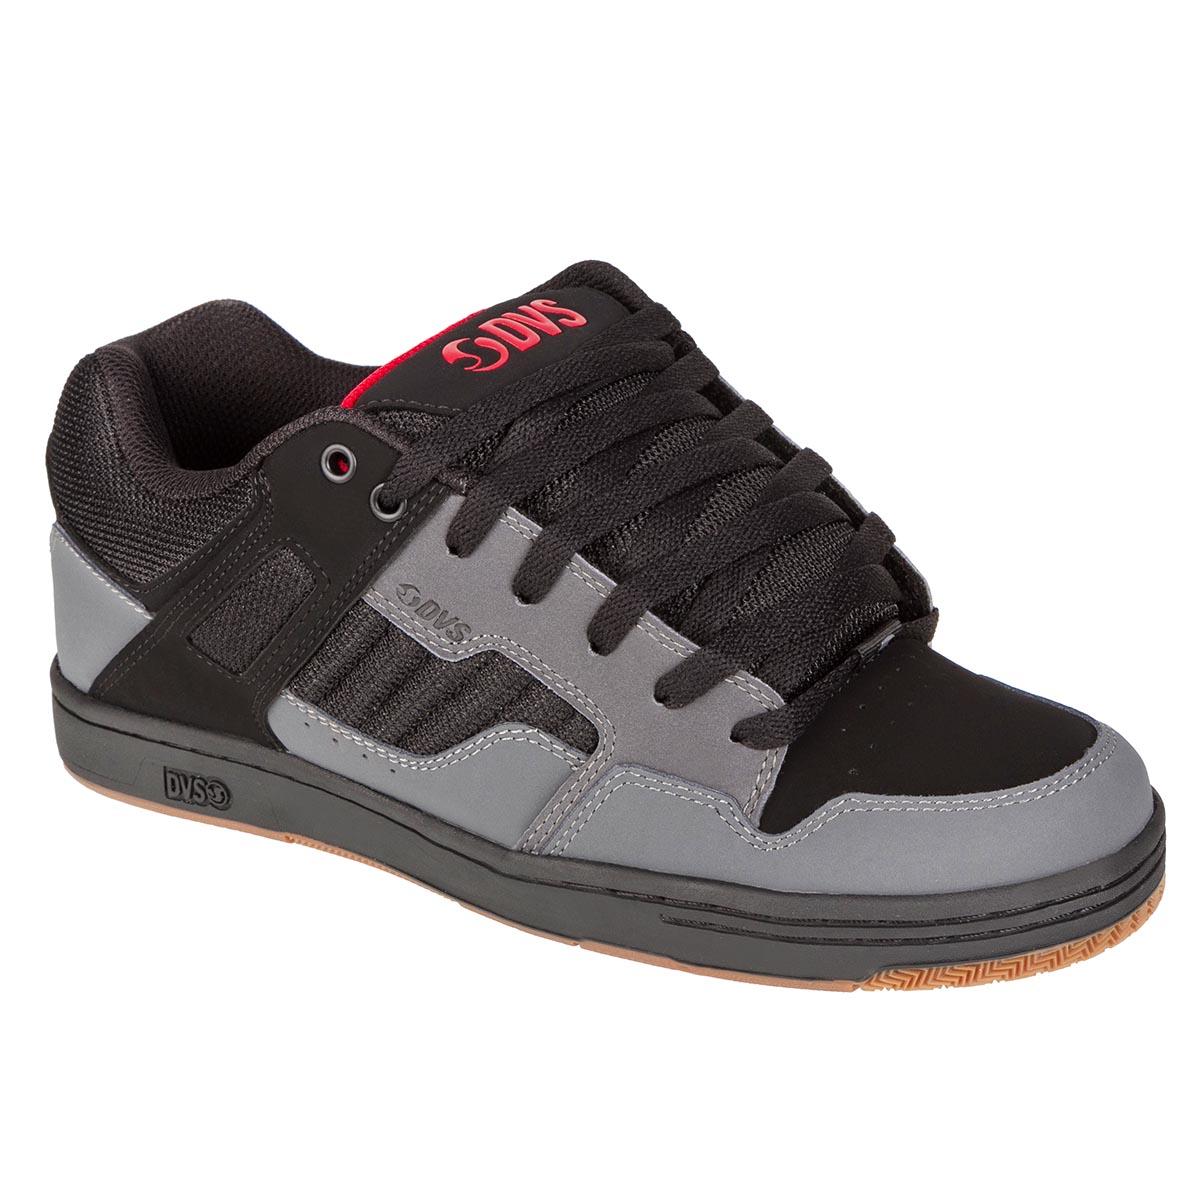 bb80c84c2f11d DVS Shoes Enduro 125 Charcoal Black Nubuck | Maciag Offroad